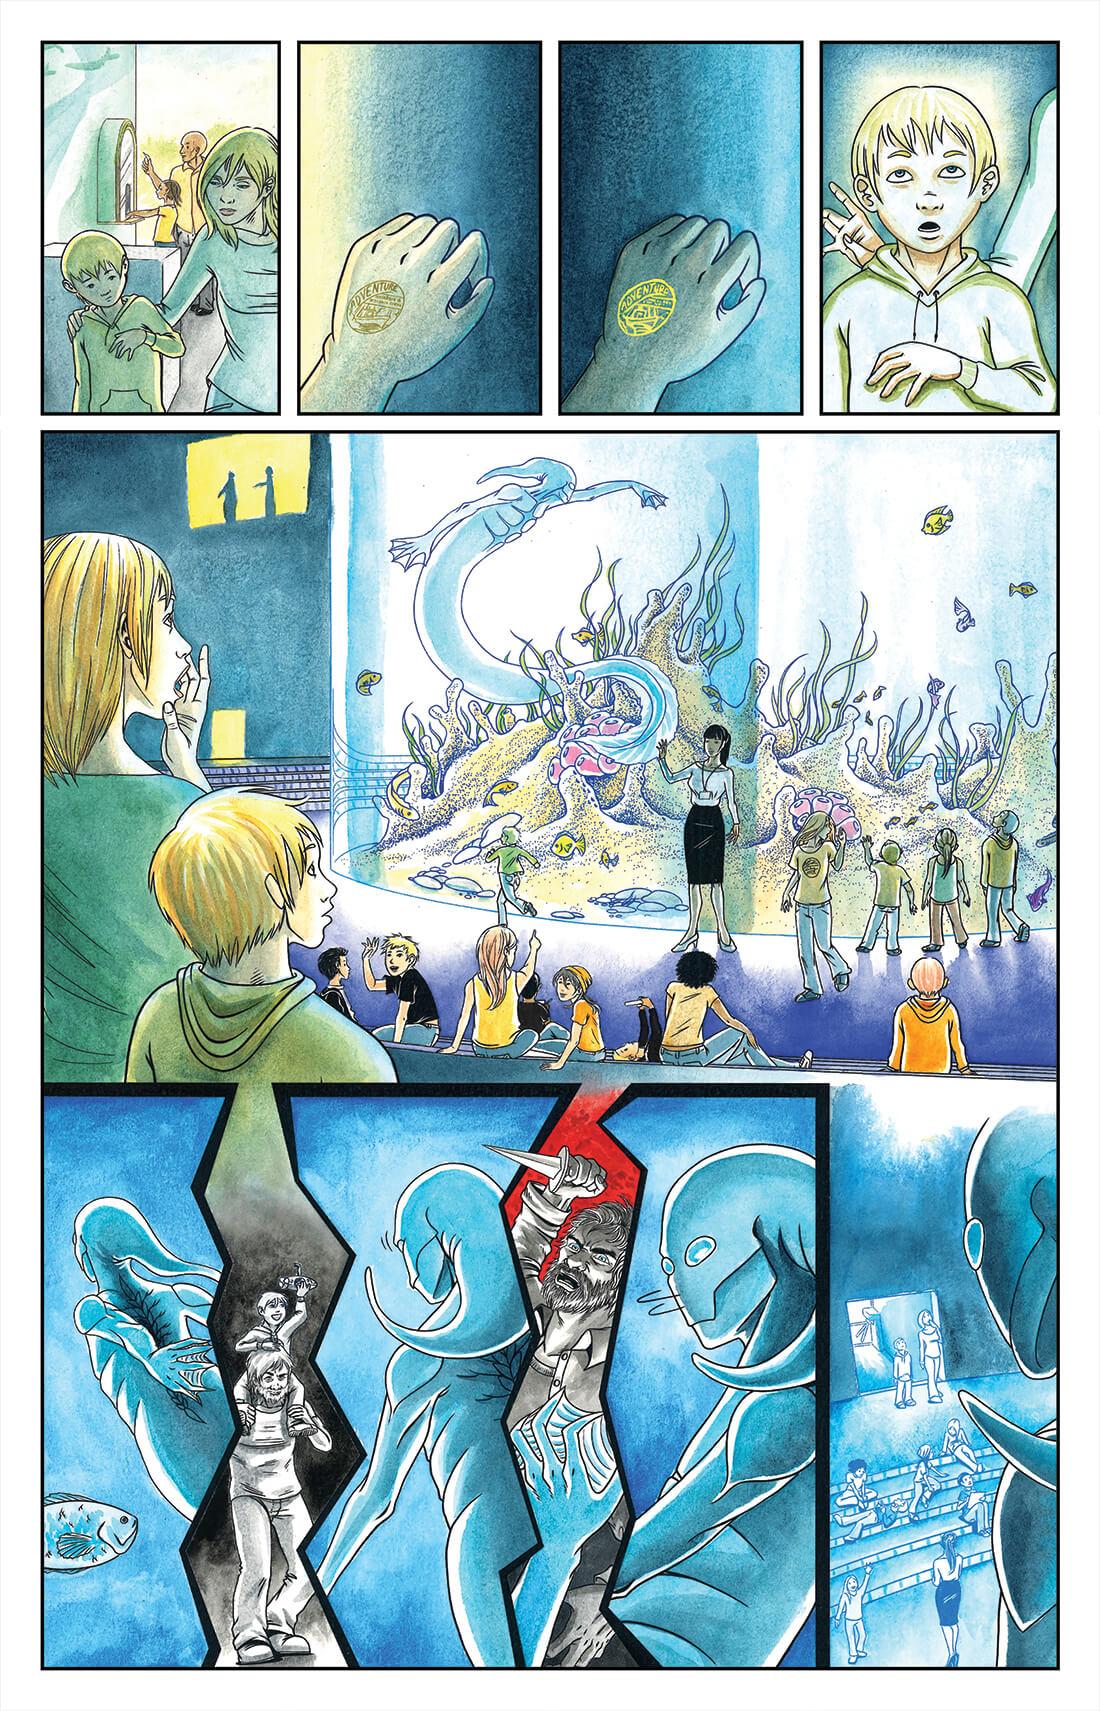 ATLA page 2